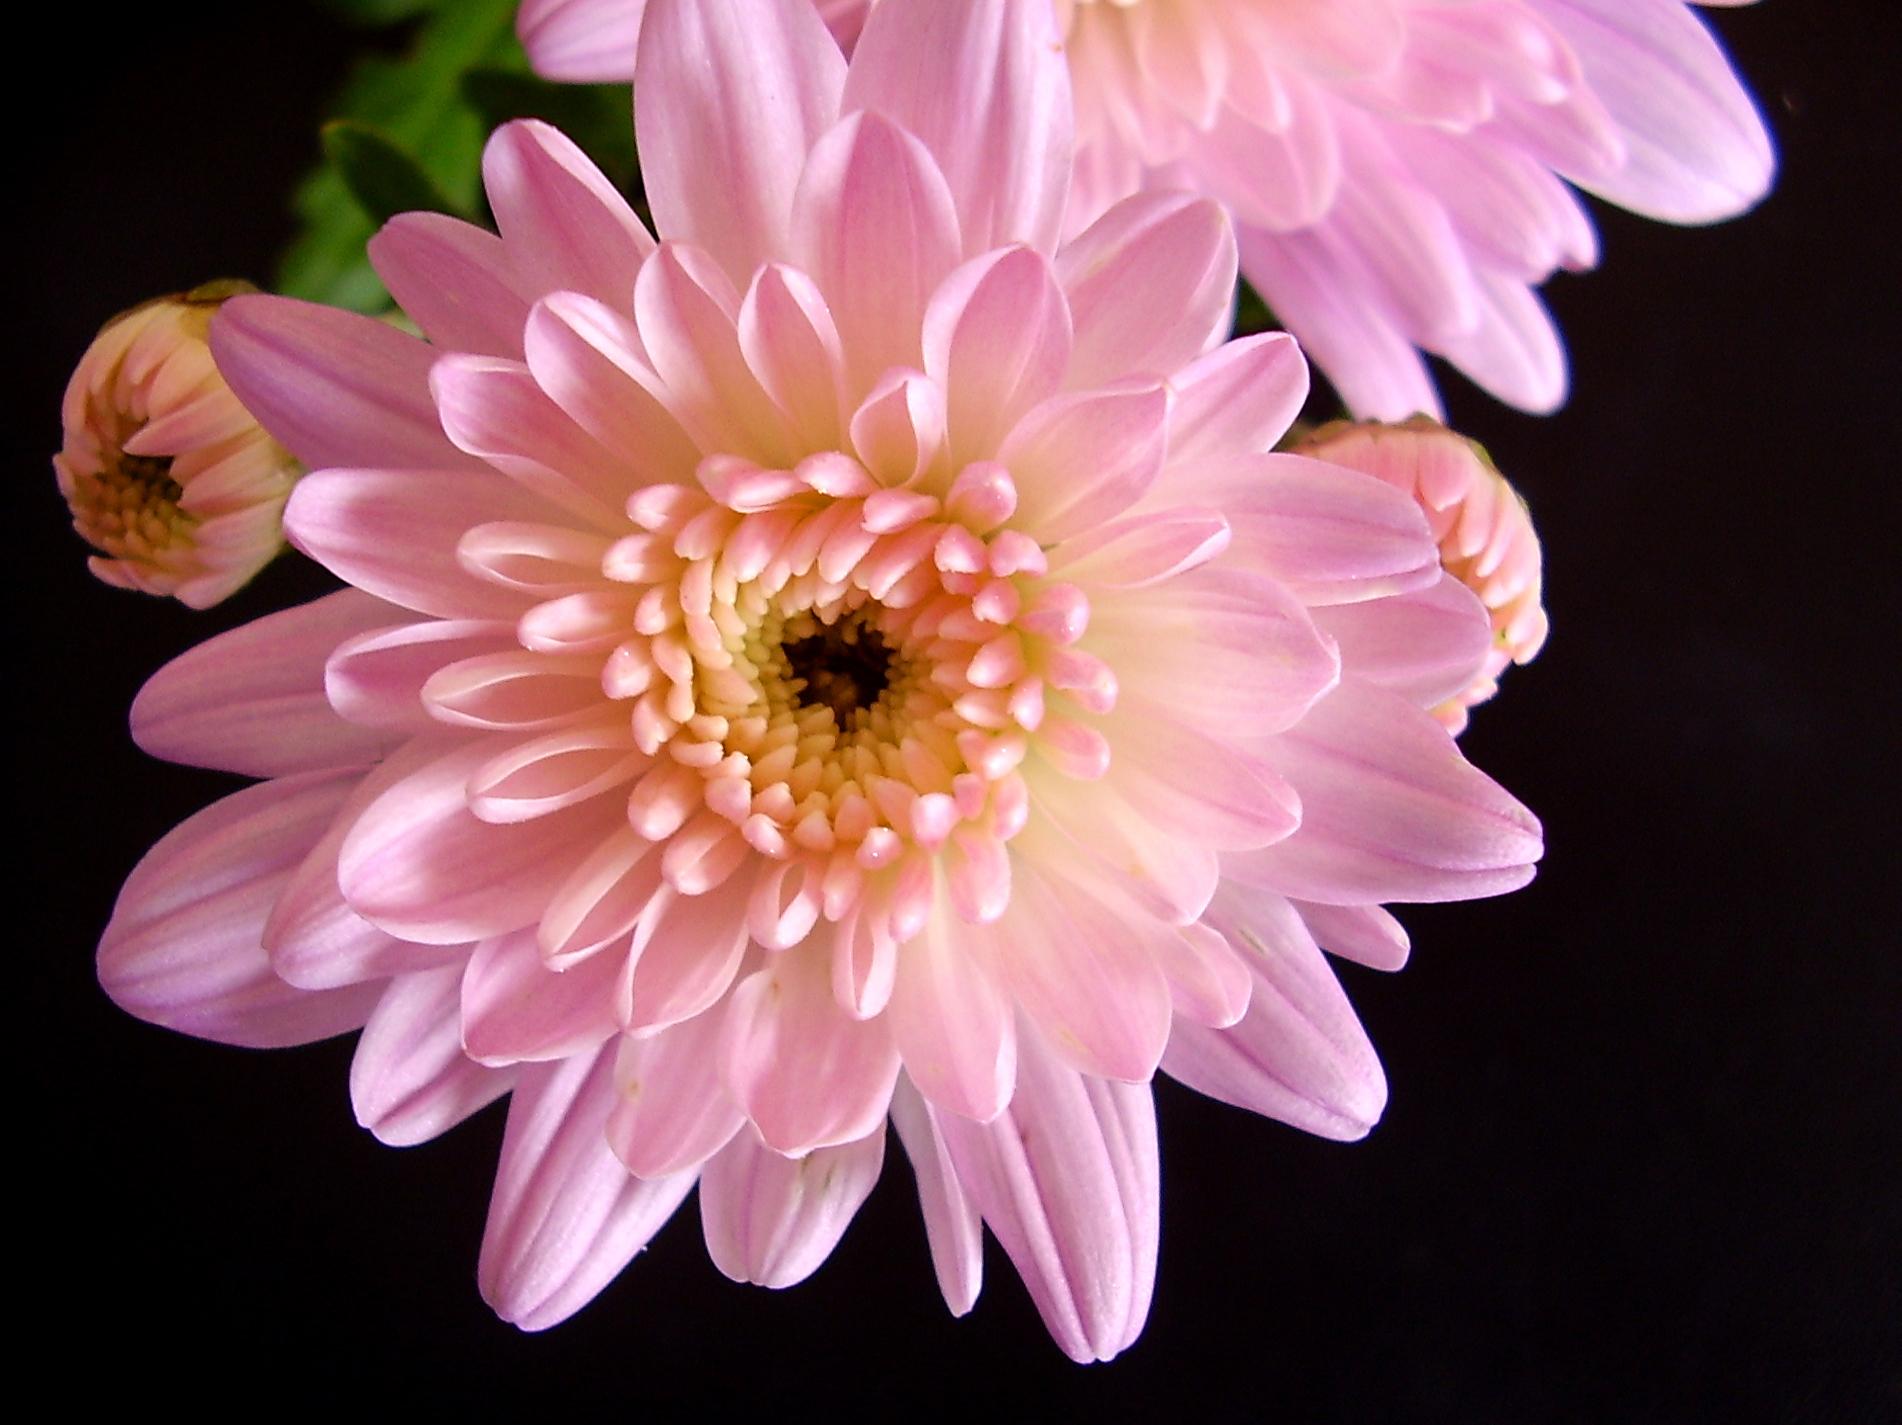 The wonderful variety of Chrysanthemums